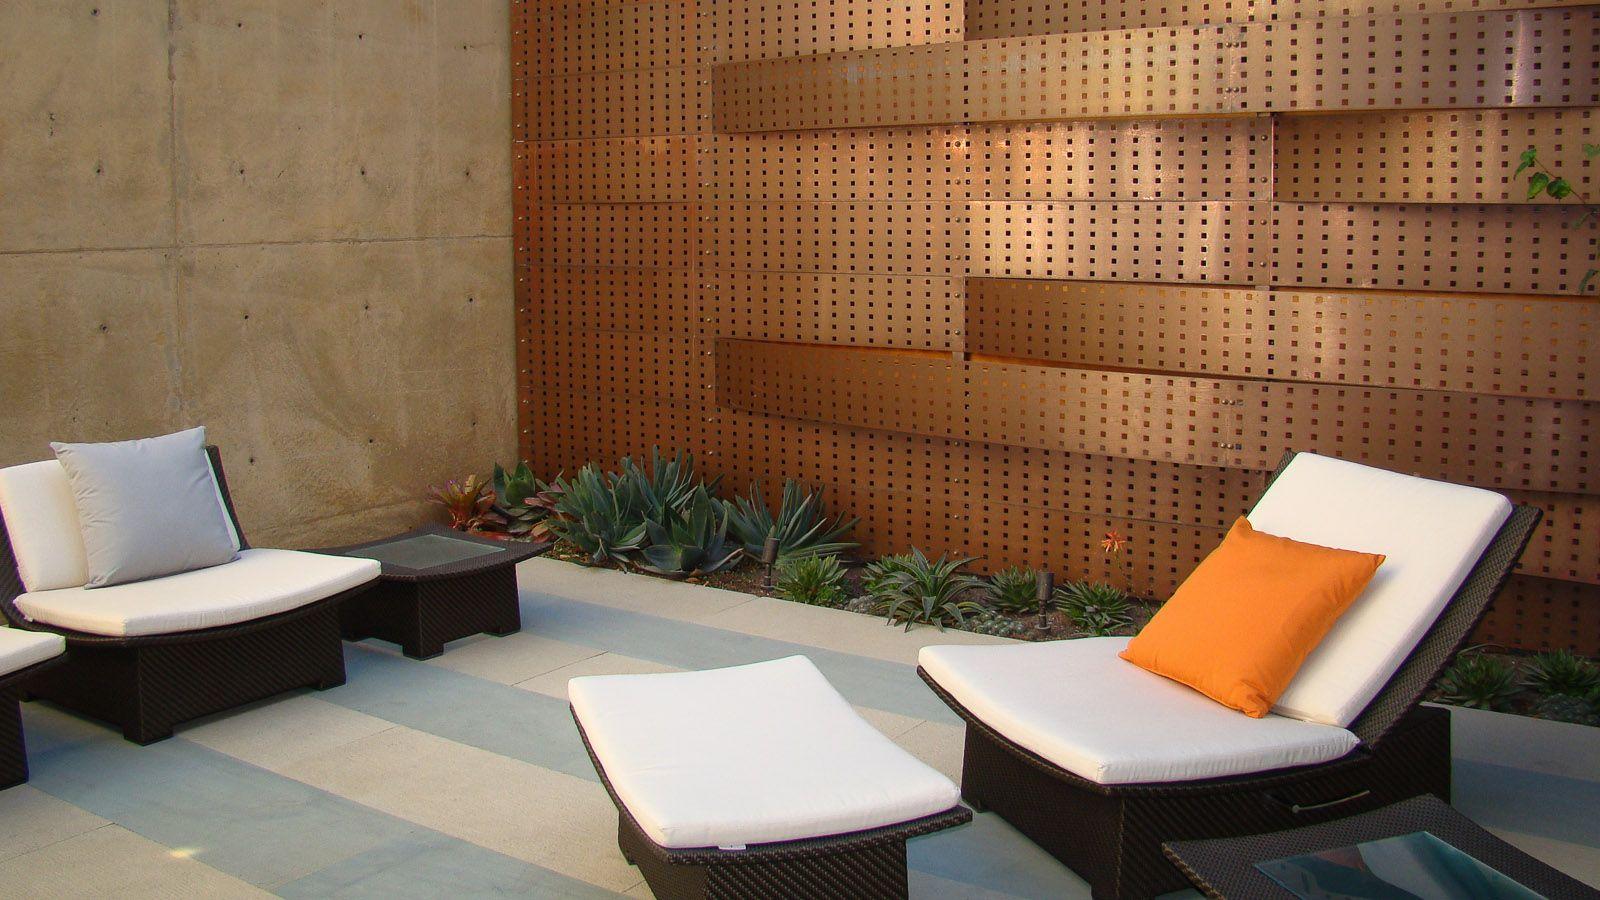 Randy Thueme Design - Vertical Weave